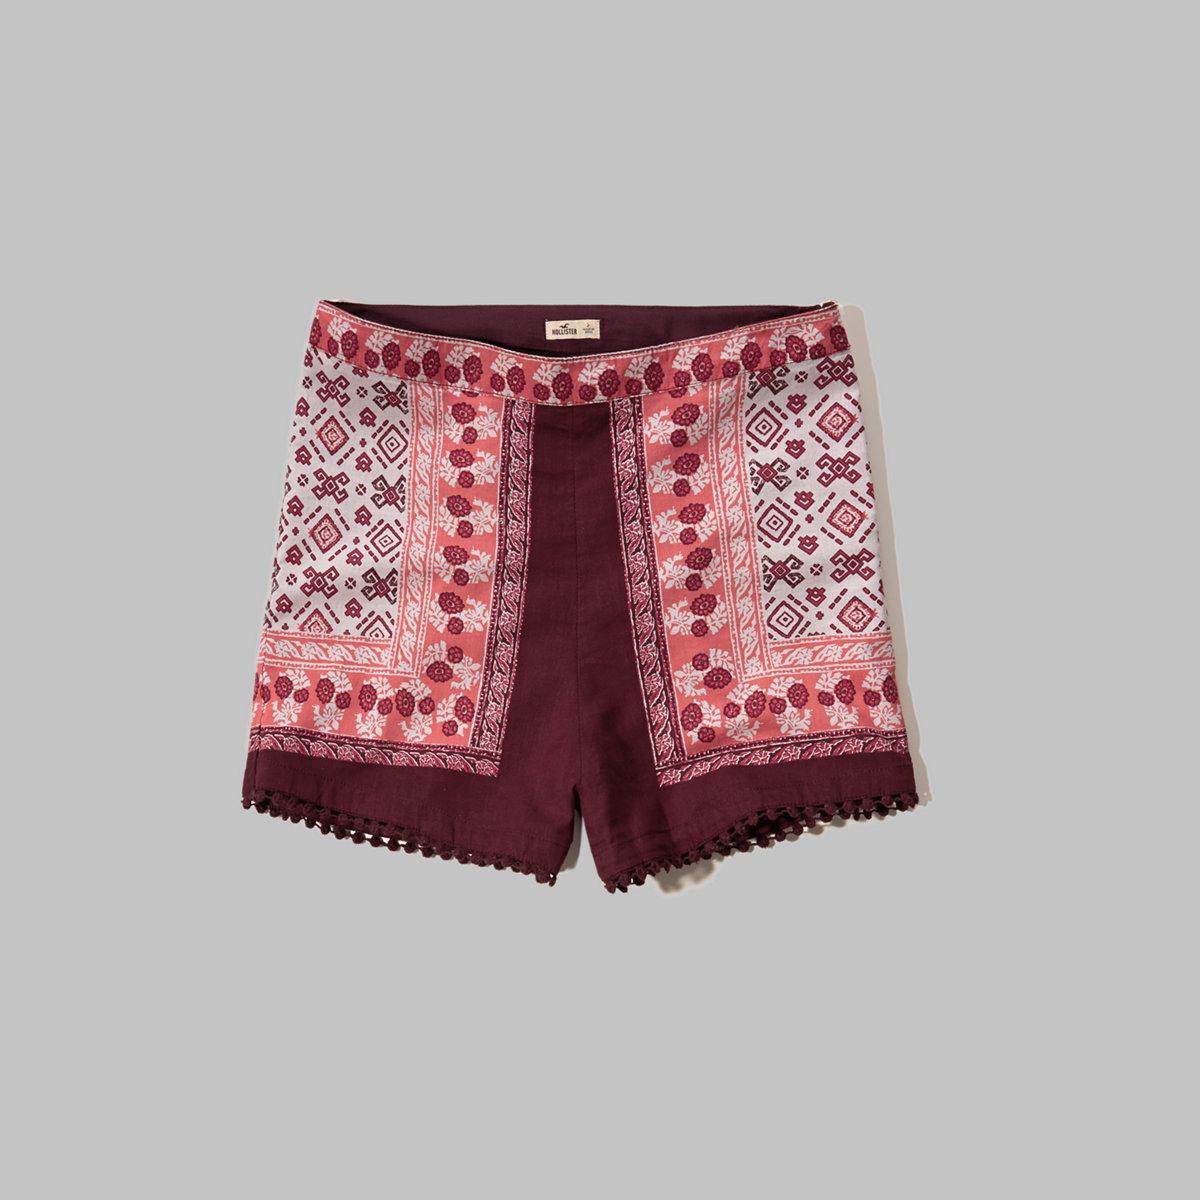 Embroidered-Hem Tap Shorts